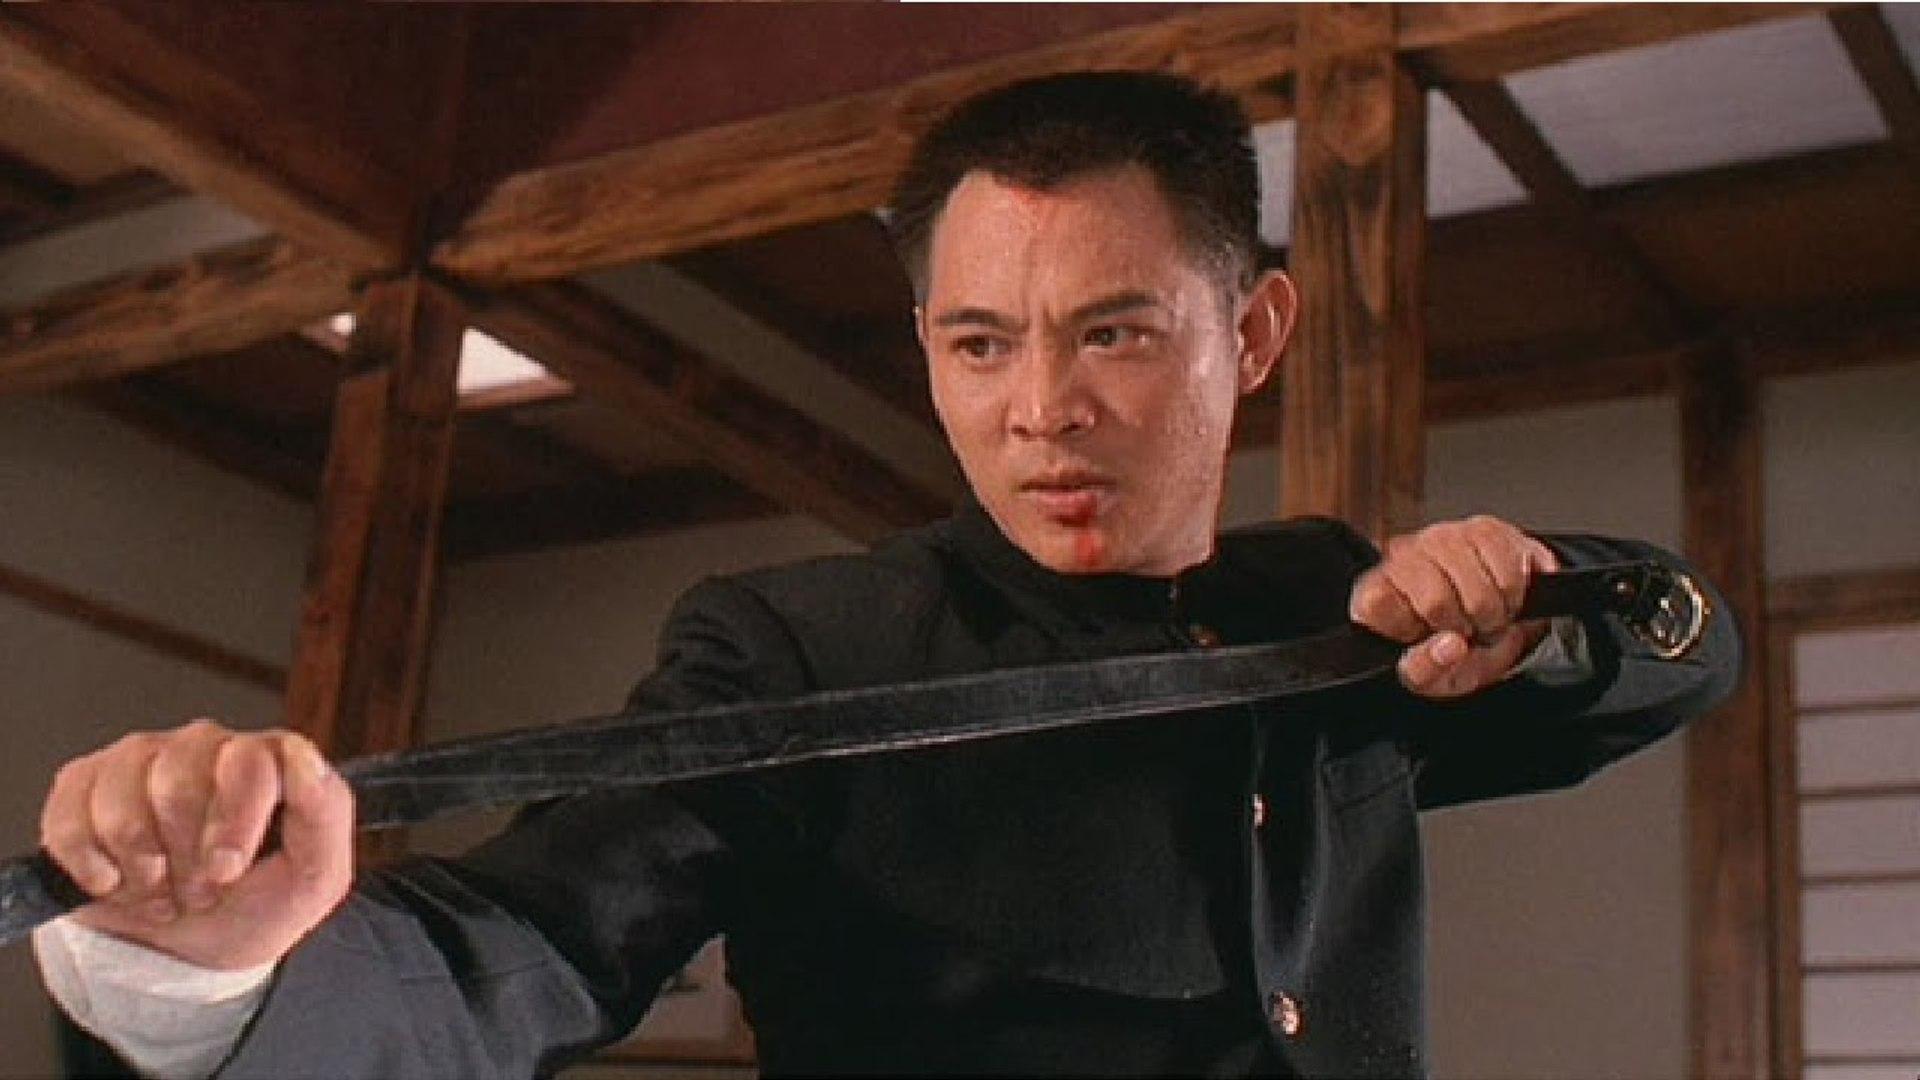 Action Movies Jet Li Fist of Legend 1994 Jet Li HD - video Dailymotion